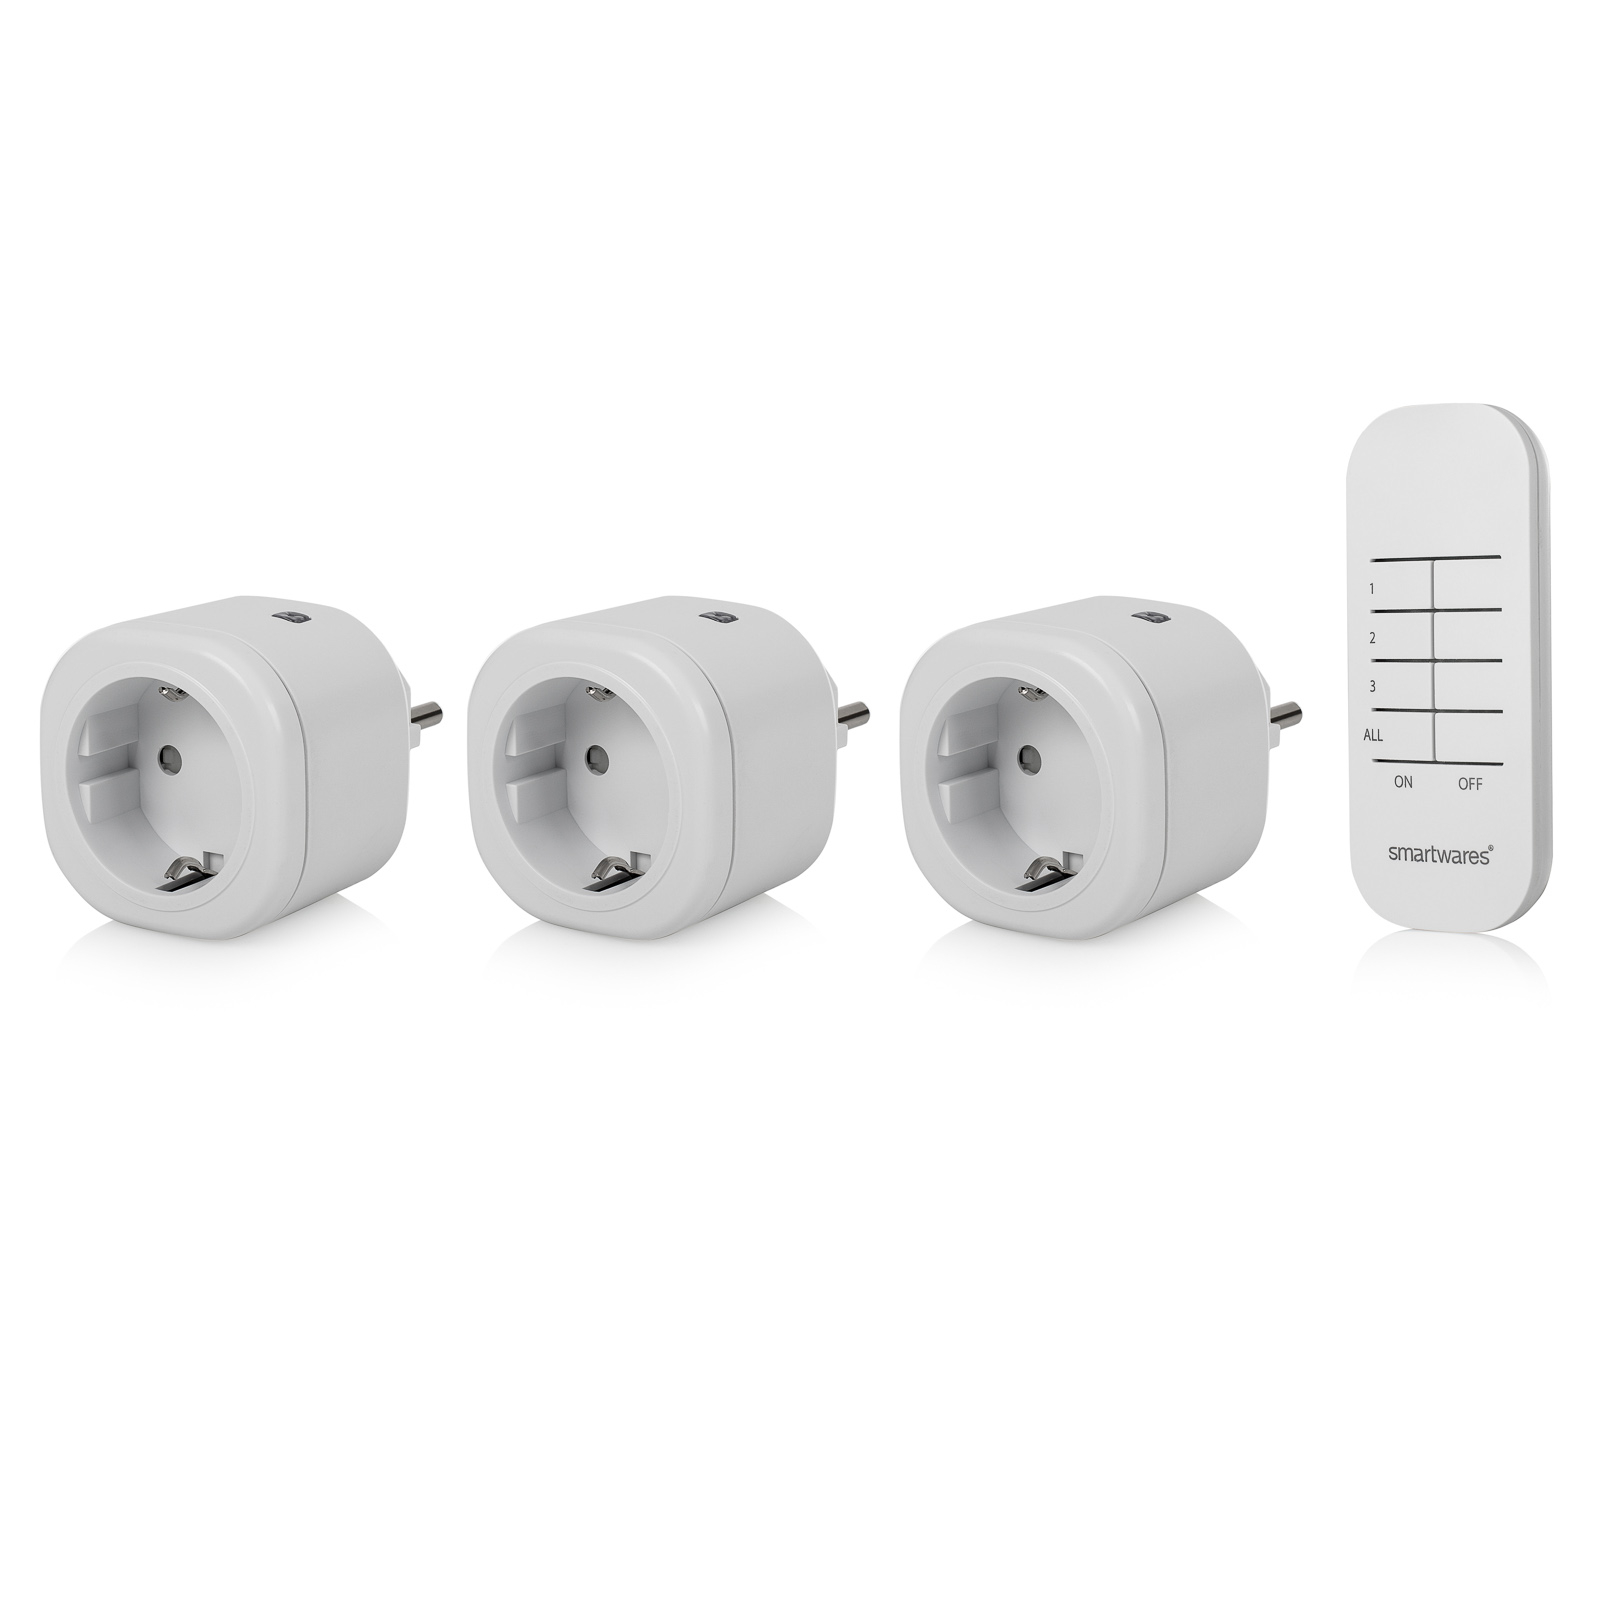 3er Mini-Funksteckdosen-Set SH4-99566 Innenbereich